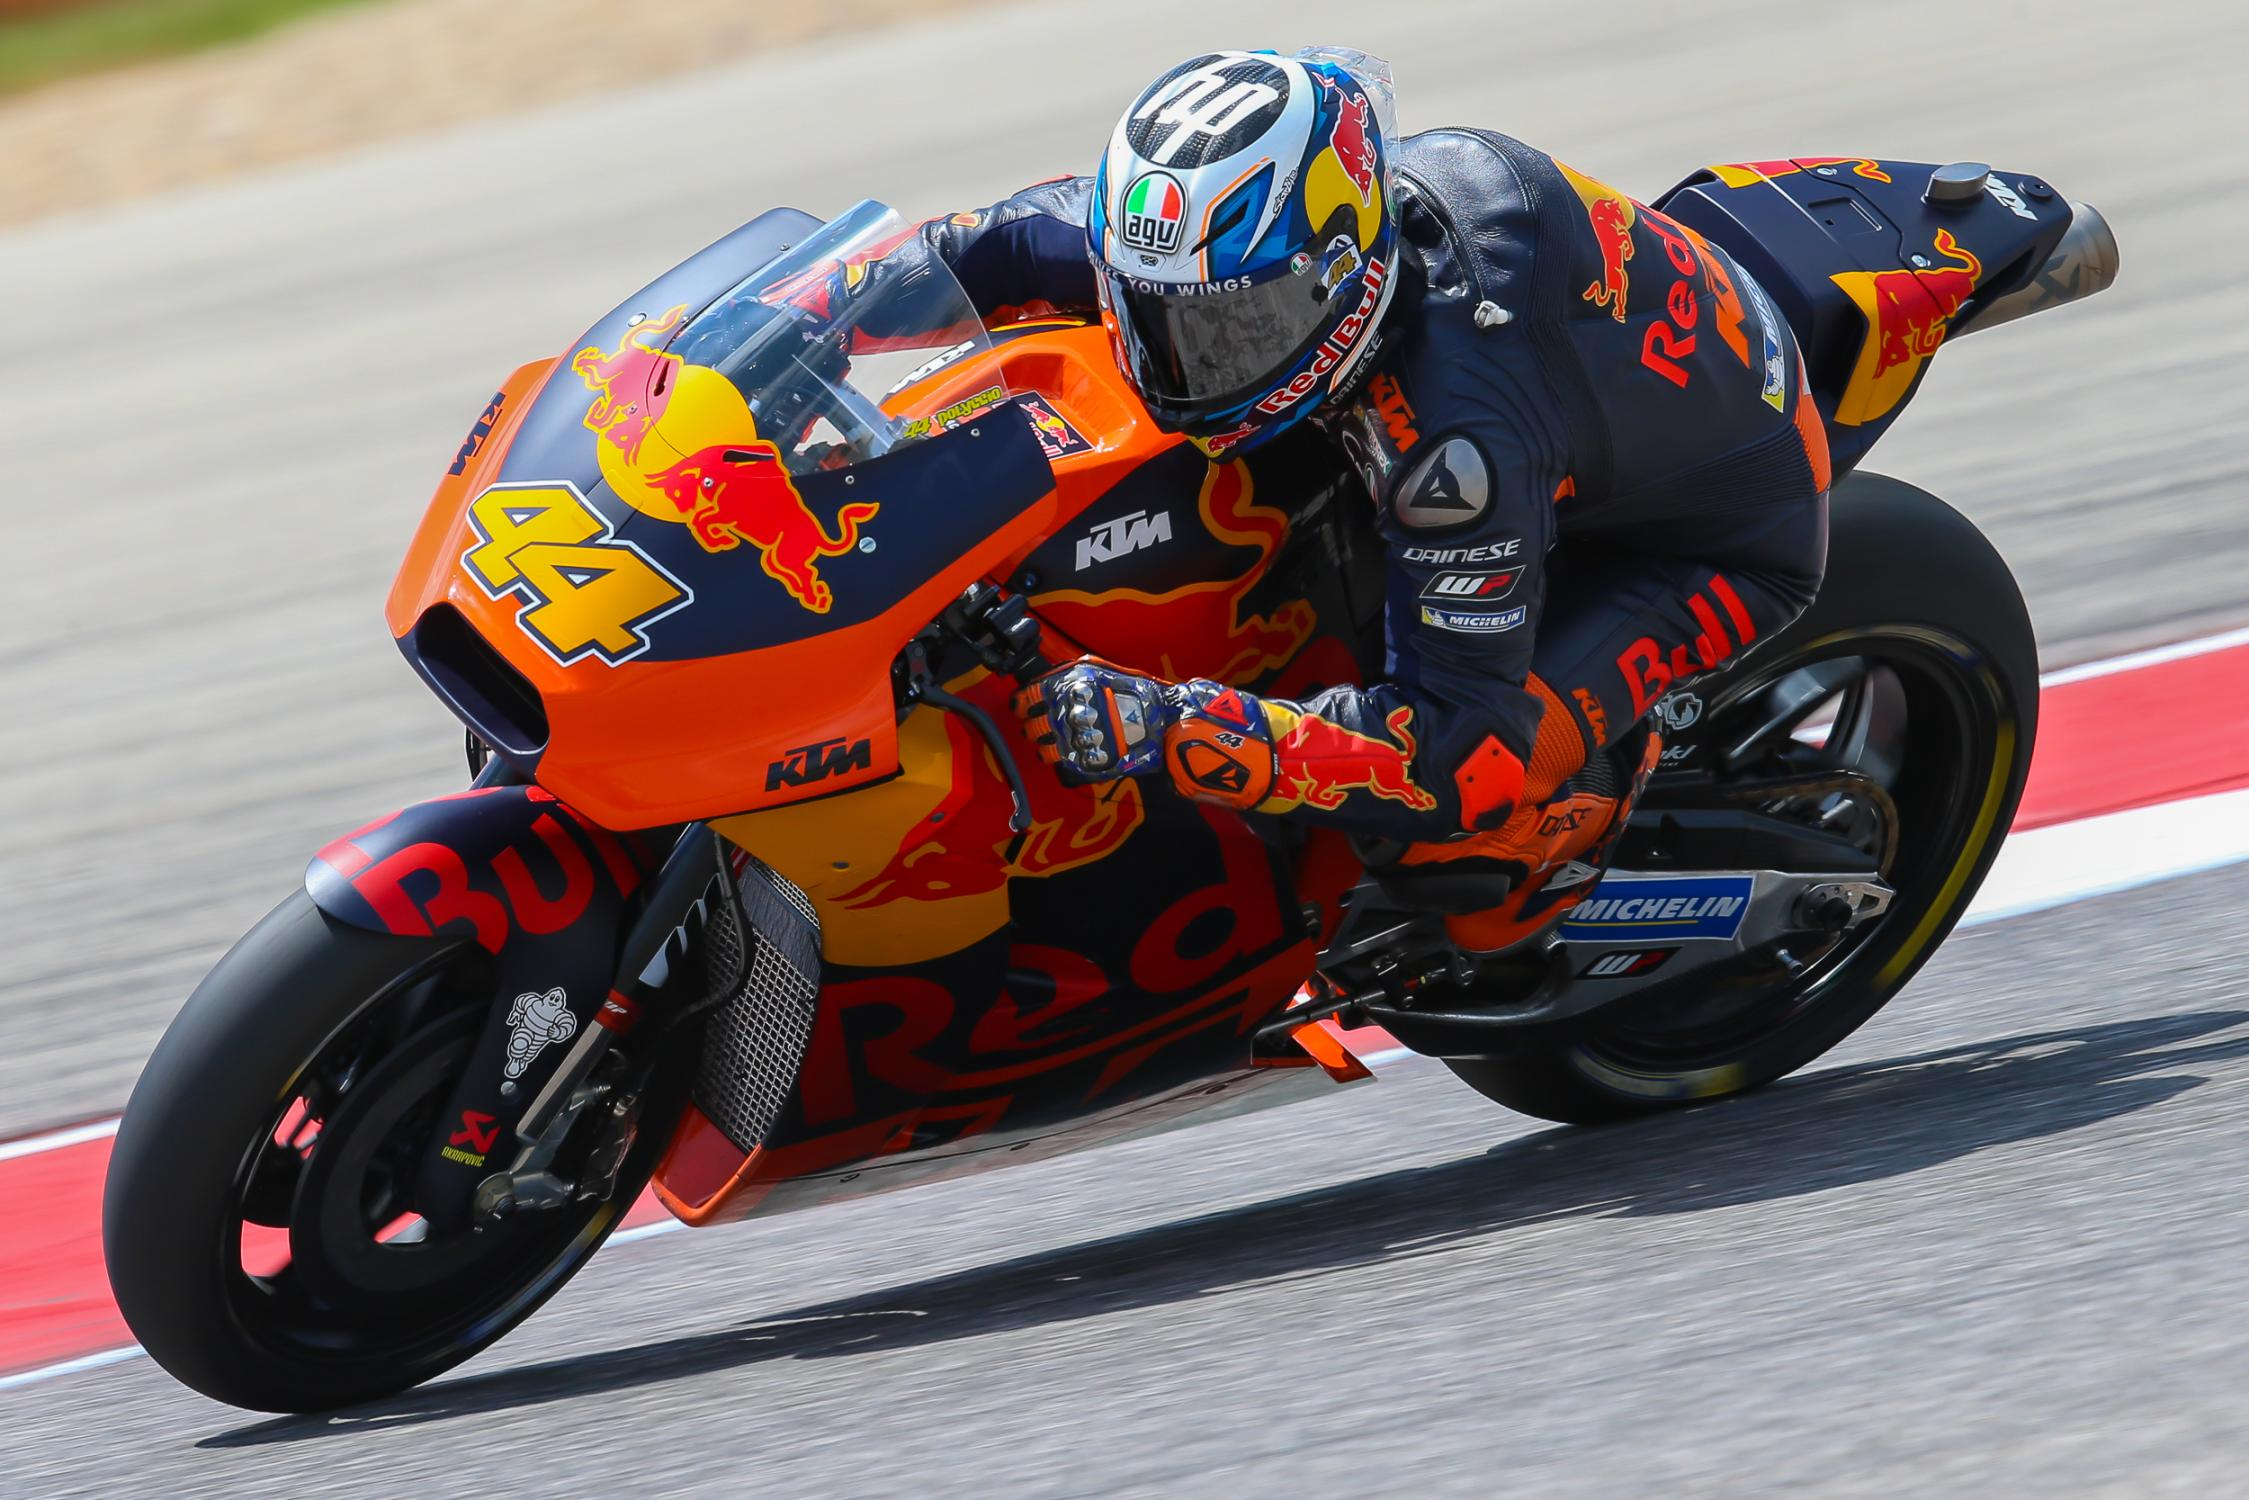 [MotoGP] Austin 44-pol-espargaro-espbl1_6245.gallery_full_top_fullscreen